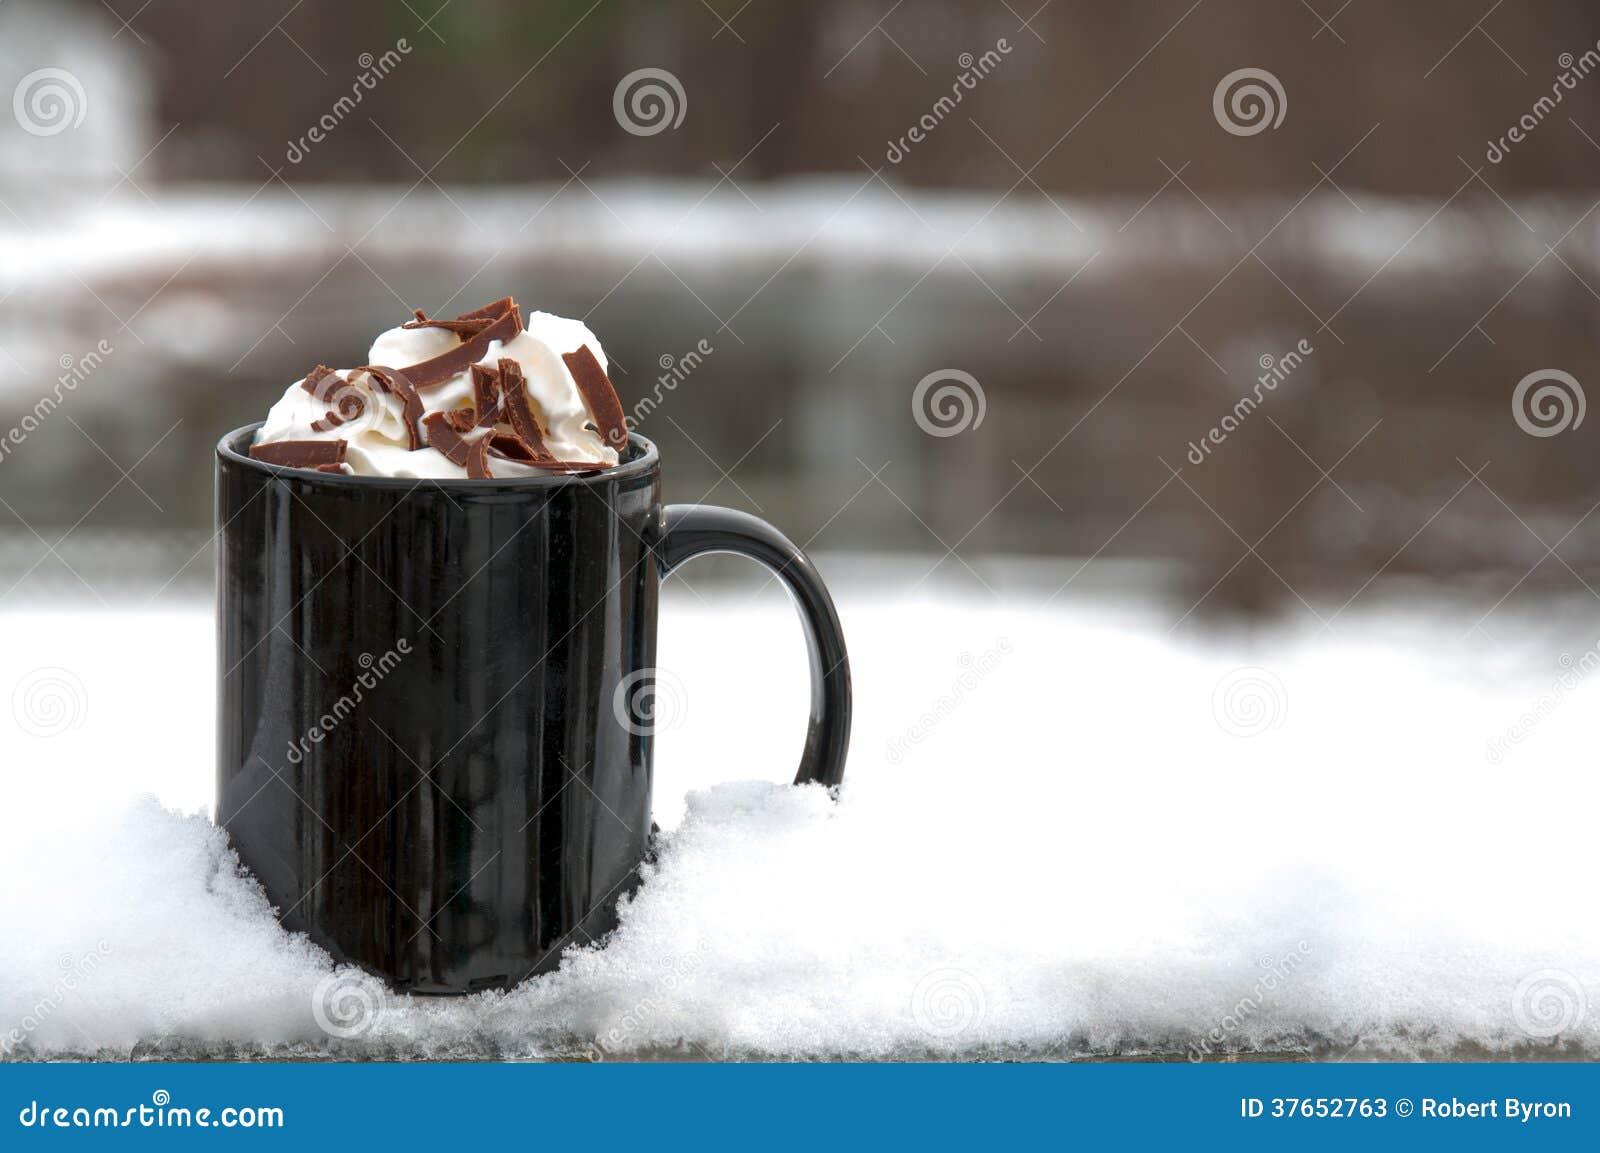 hot chocolate or coffee stock photos image 37652763